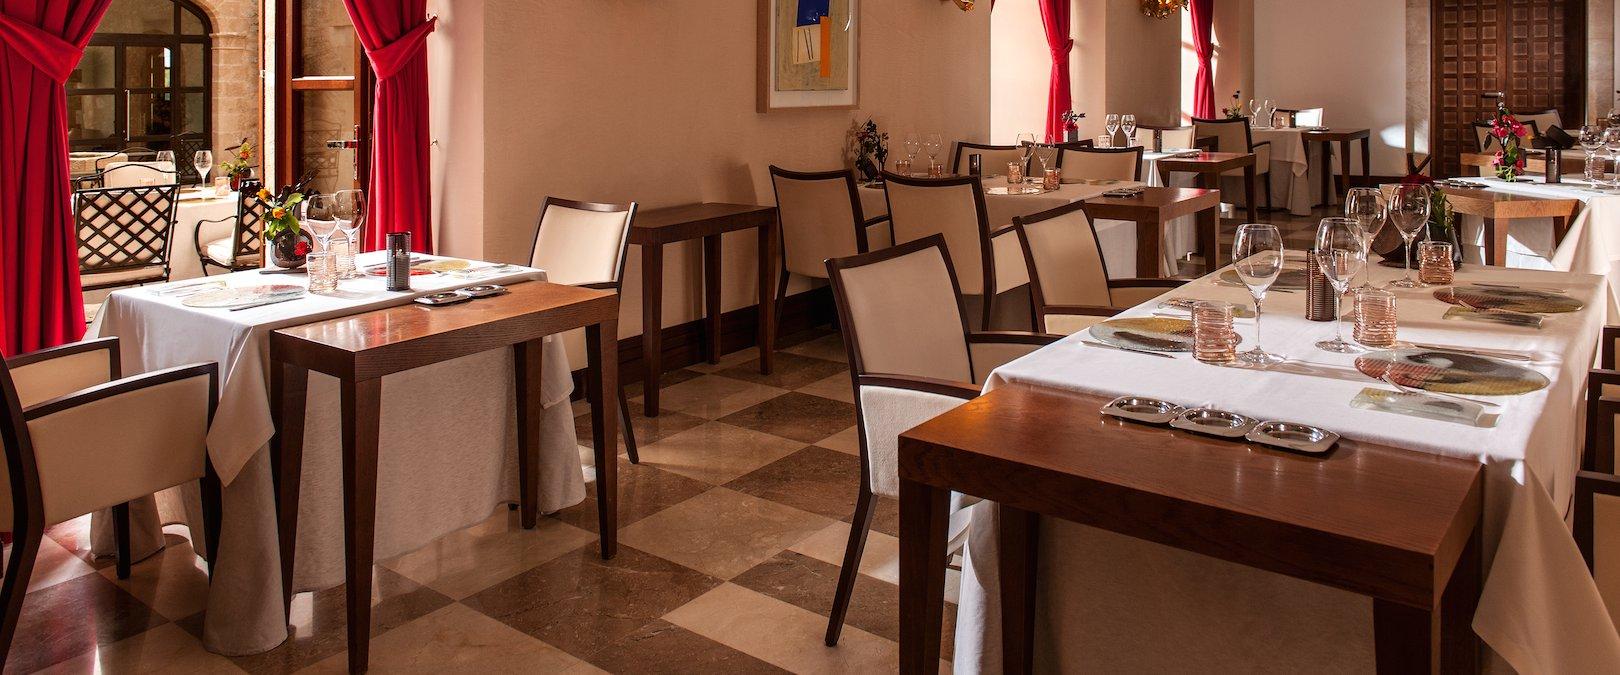 Zaranda restaurant